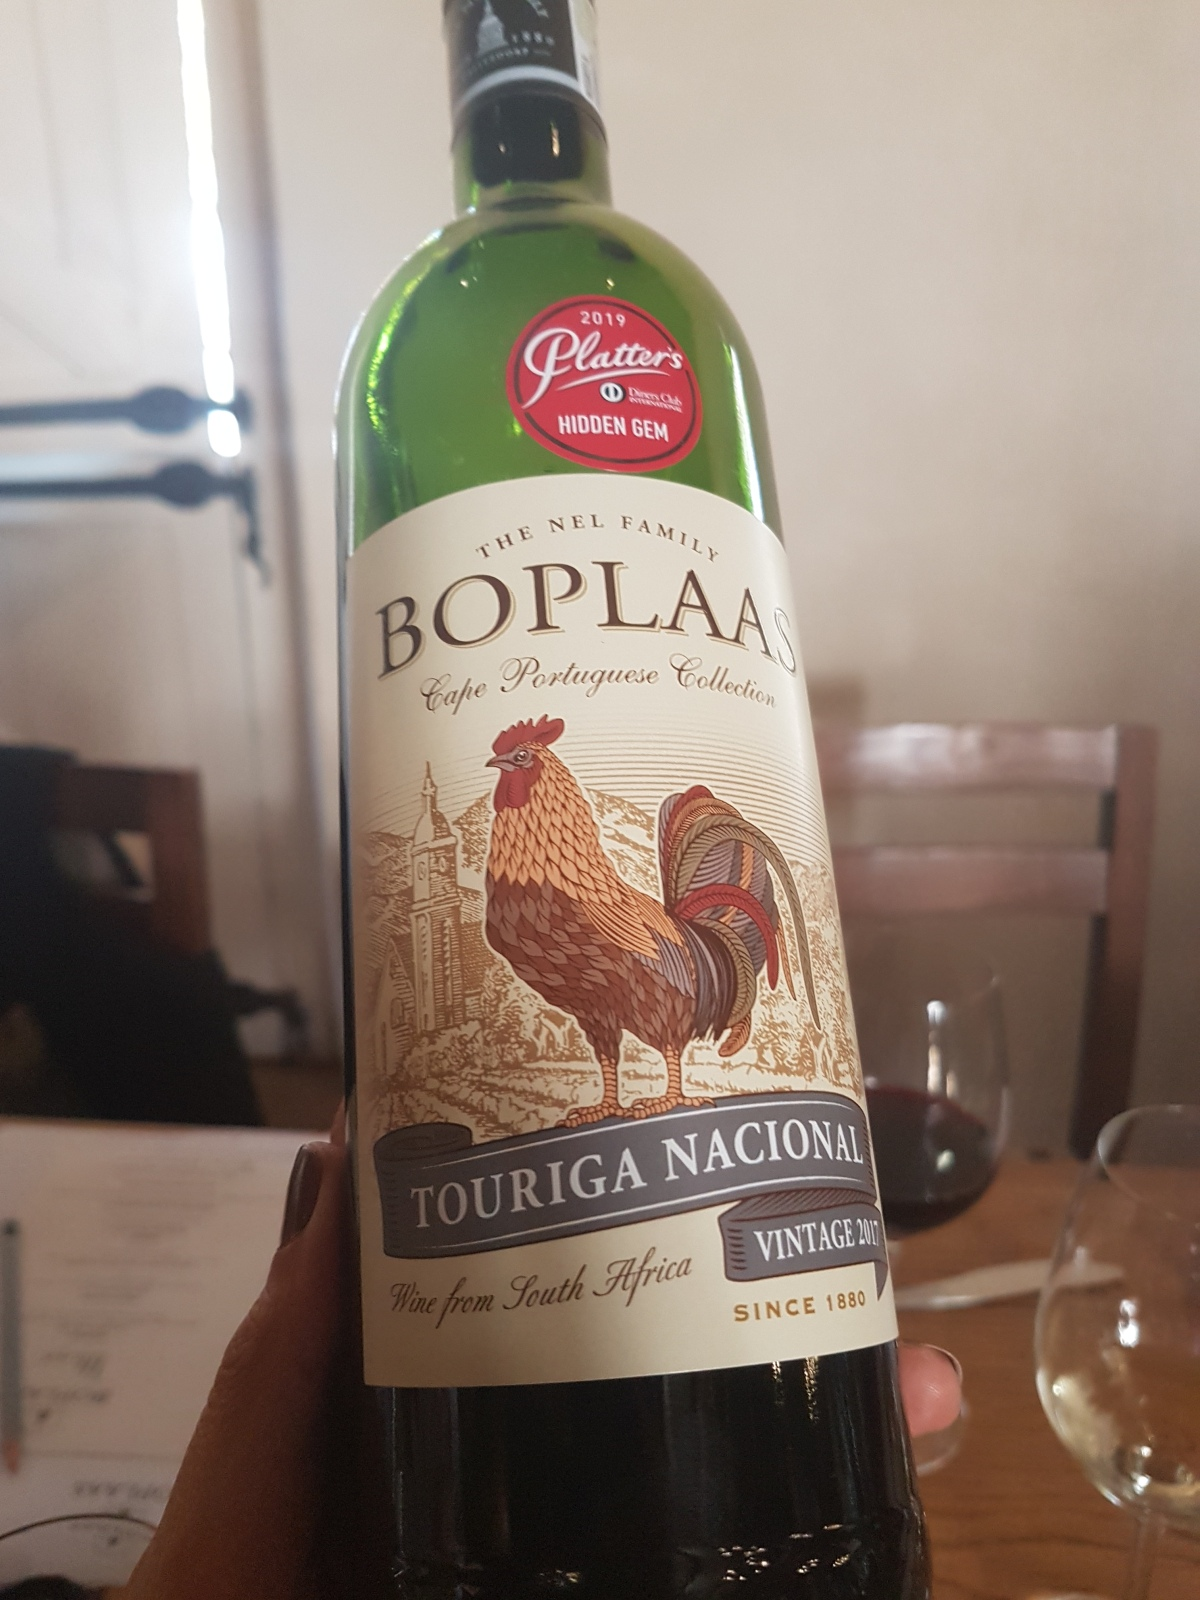 Boplaas Family Vineyards Celebrate Their Portuguese Wine Range Over Lunch at JonkershuisRestaurant